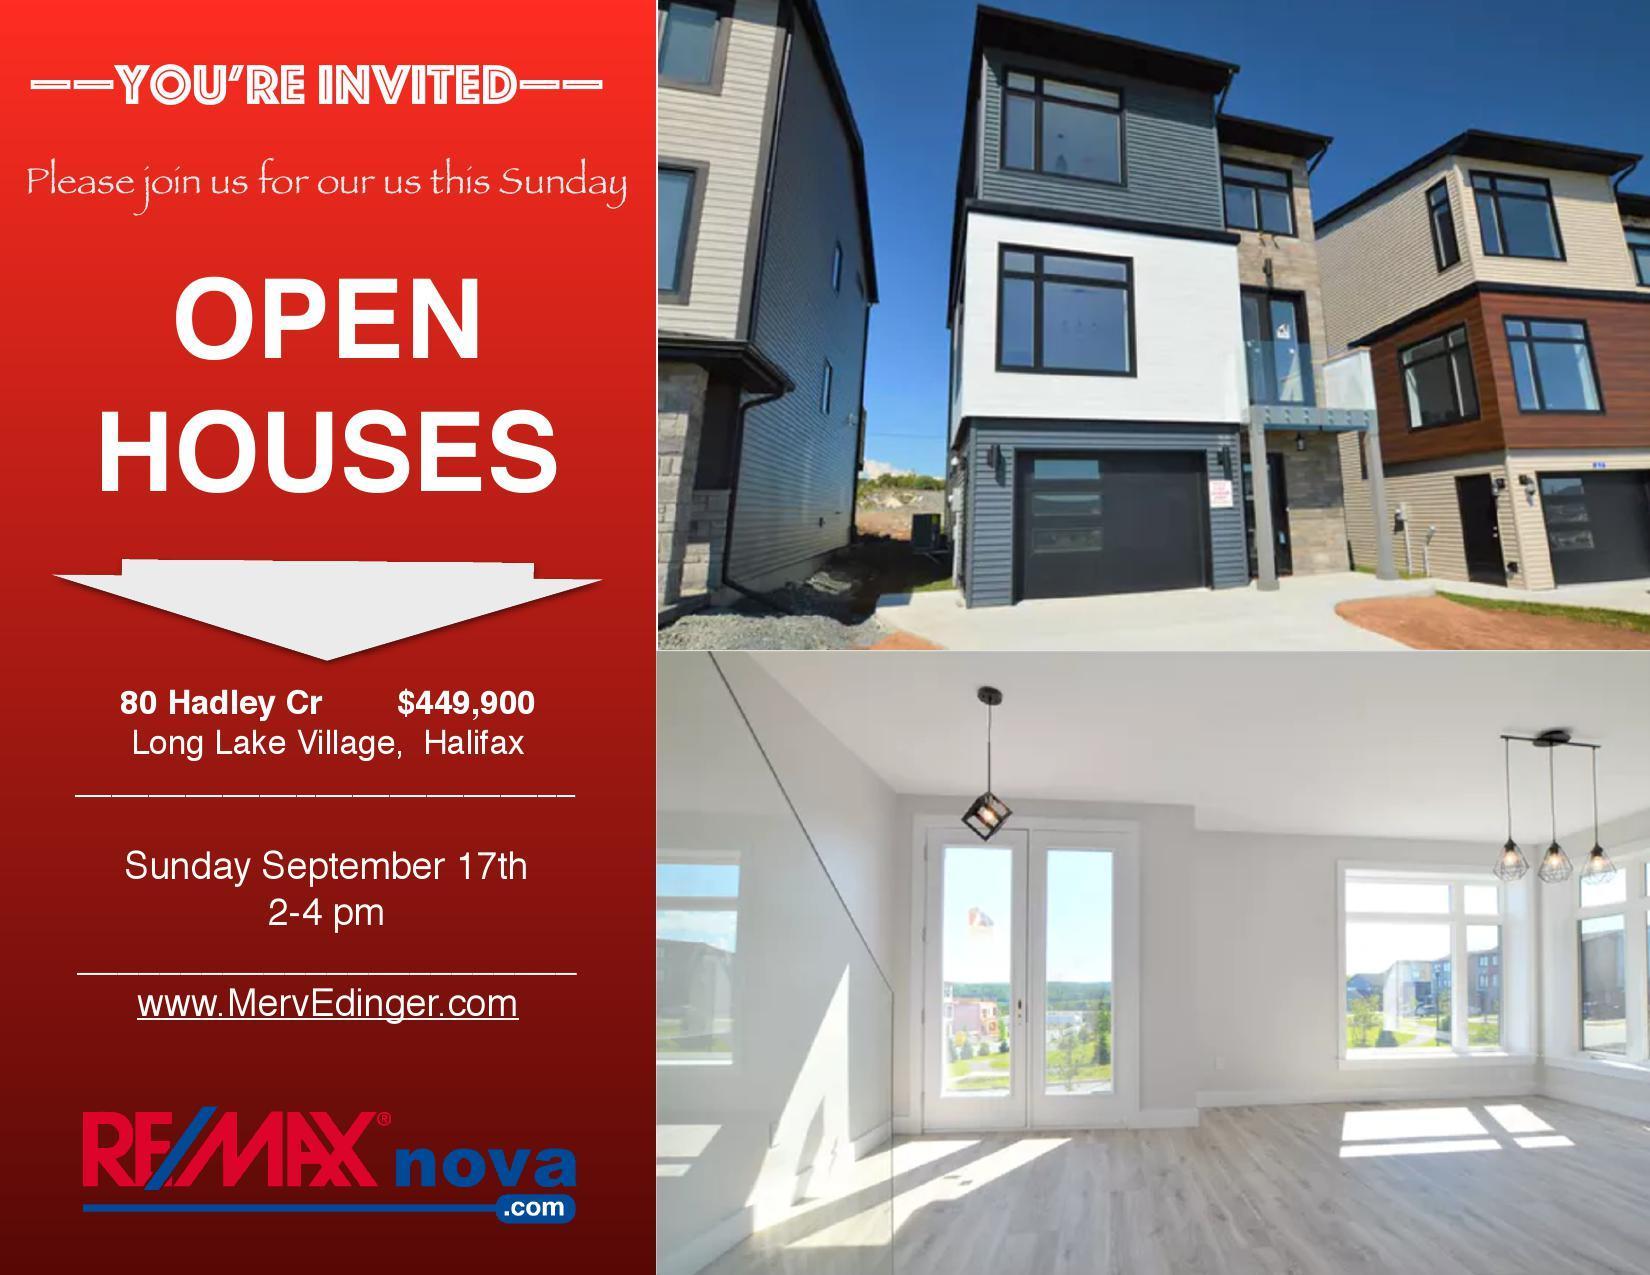 Open Houses in Halifax